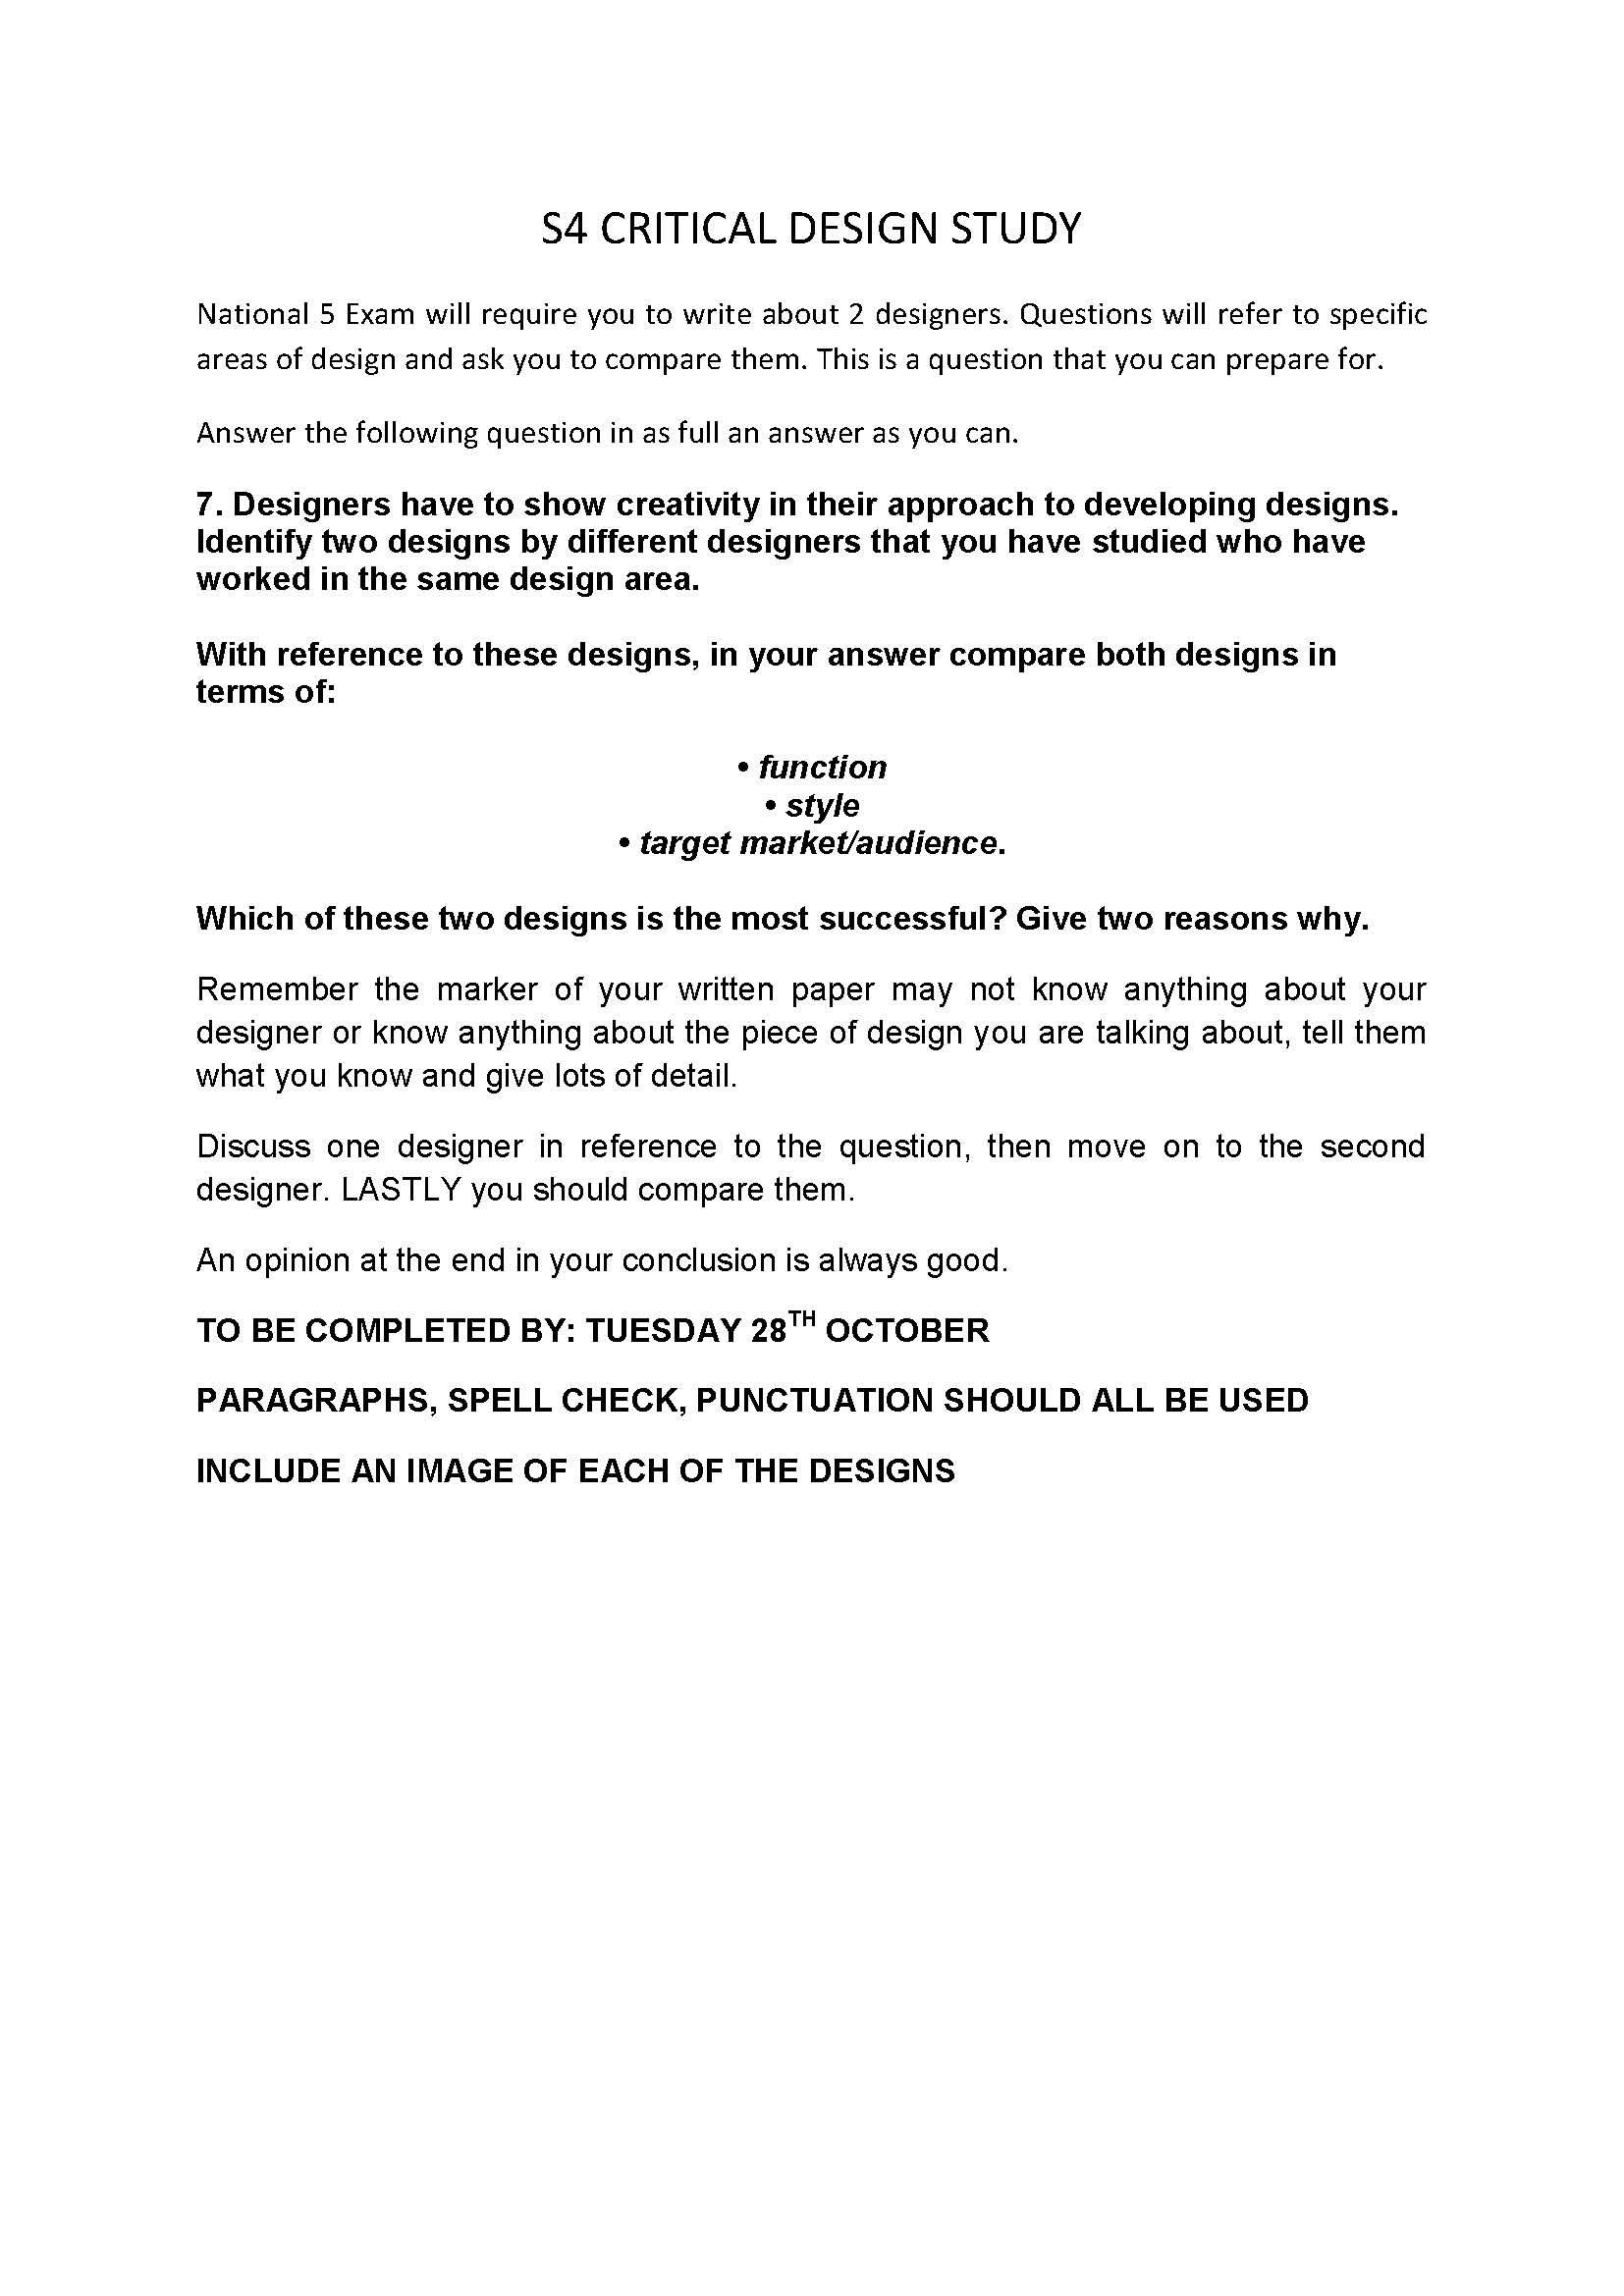 Critical Design Homework Due 28th October